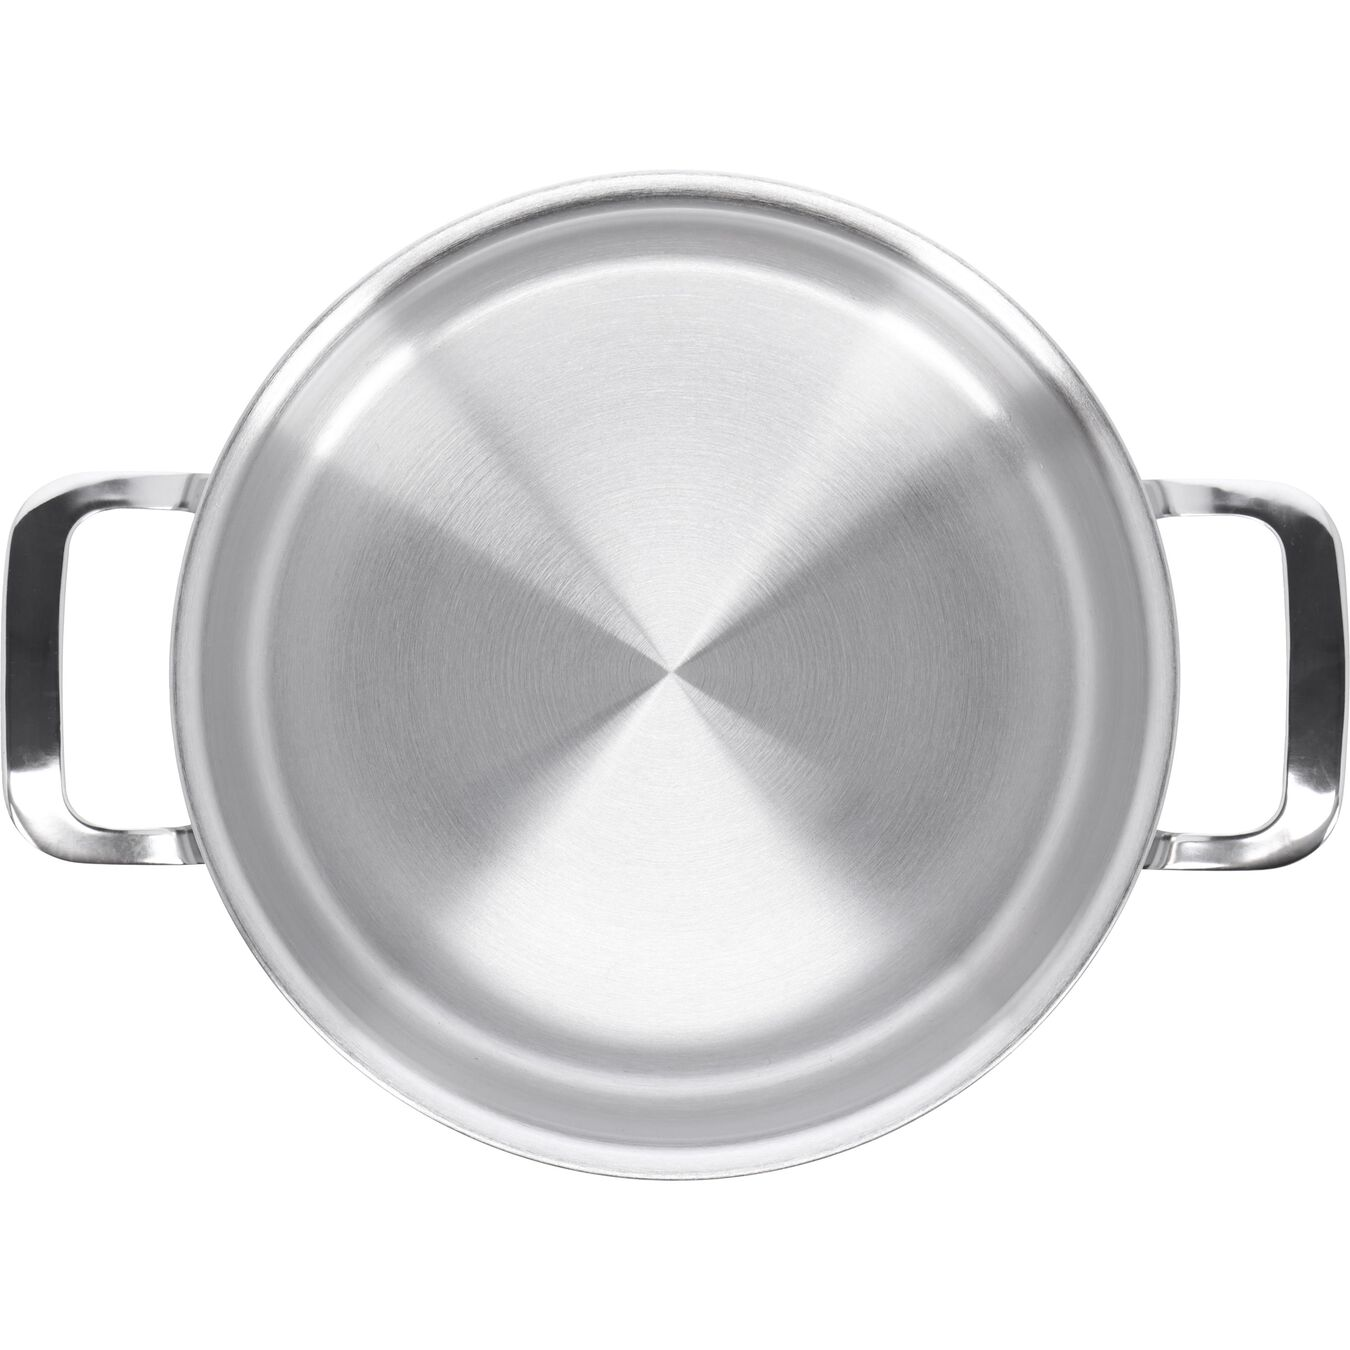 Kookpot met dubbelwandig deksel, 22 cm / 4 l,,large 3